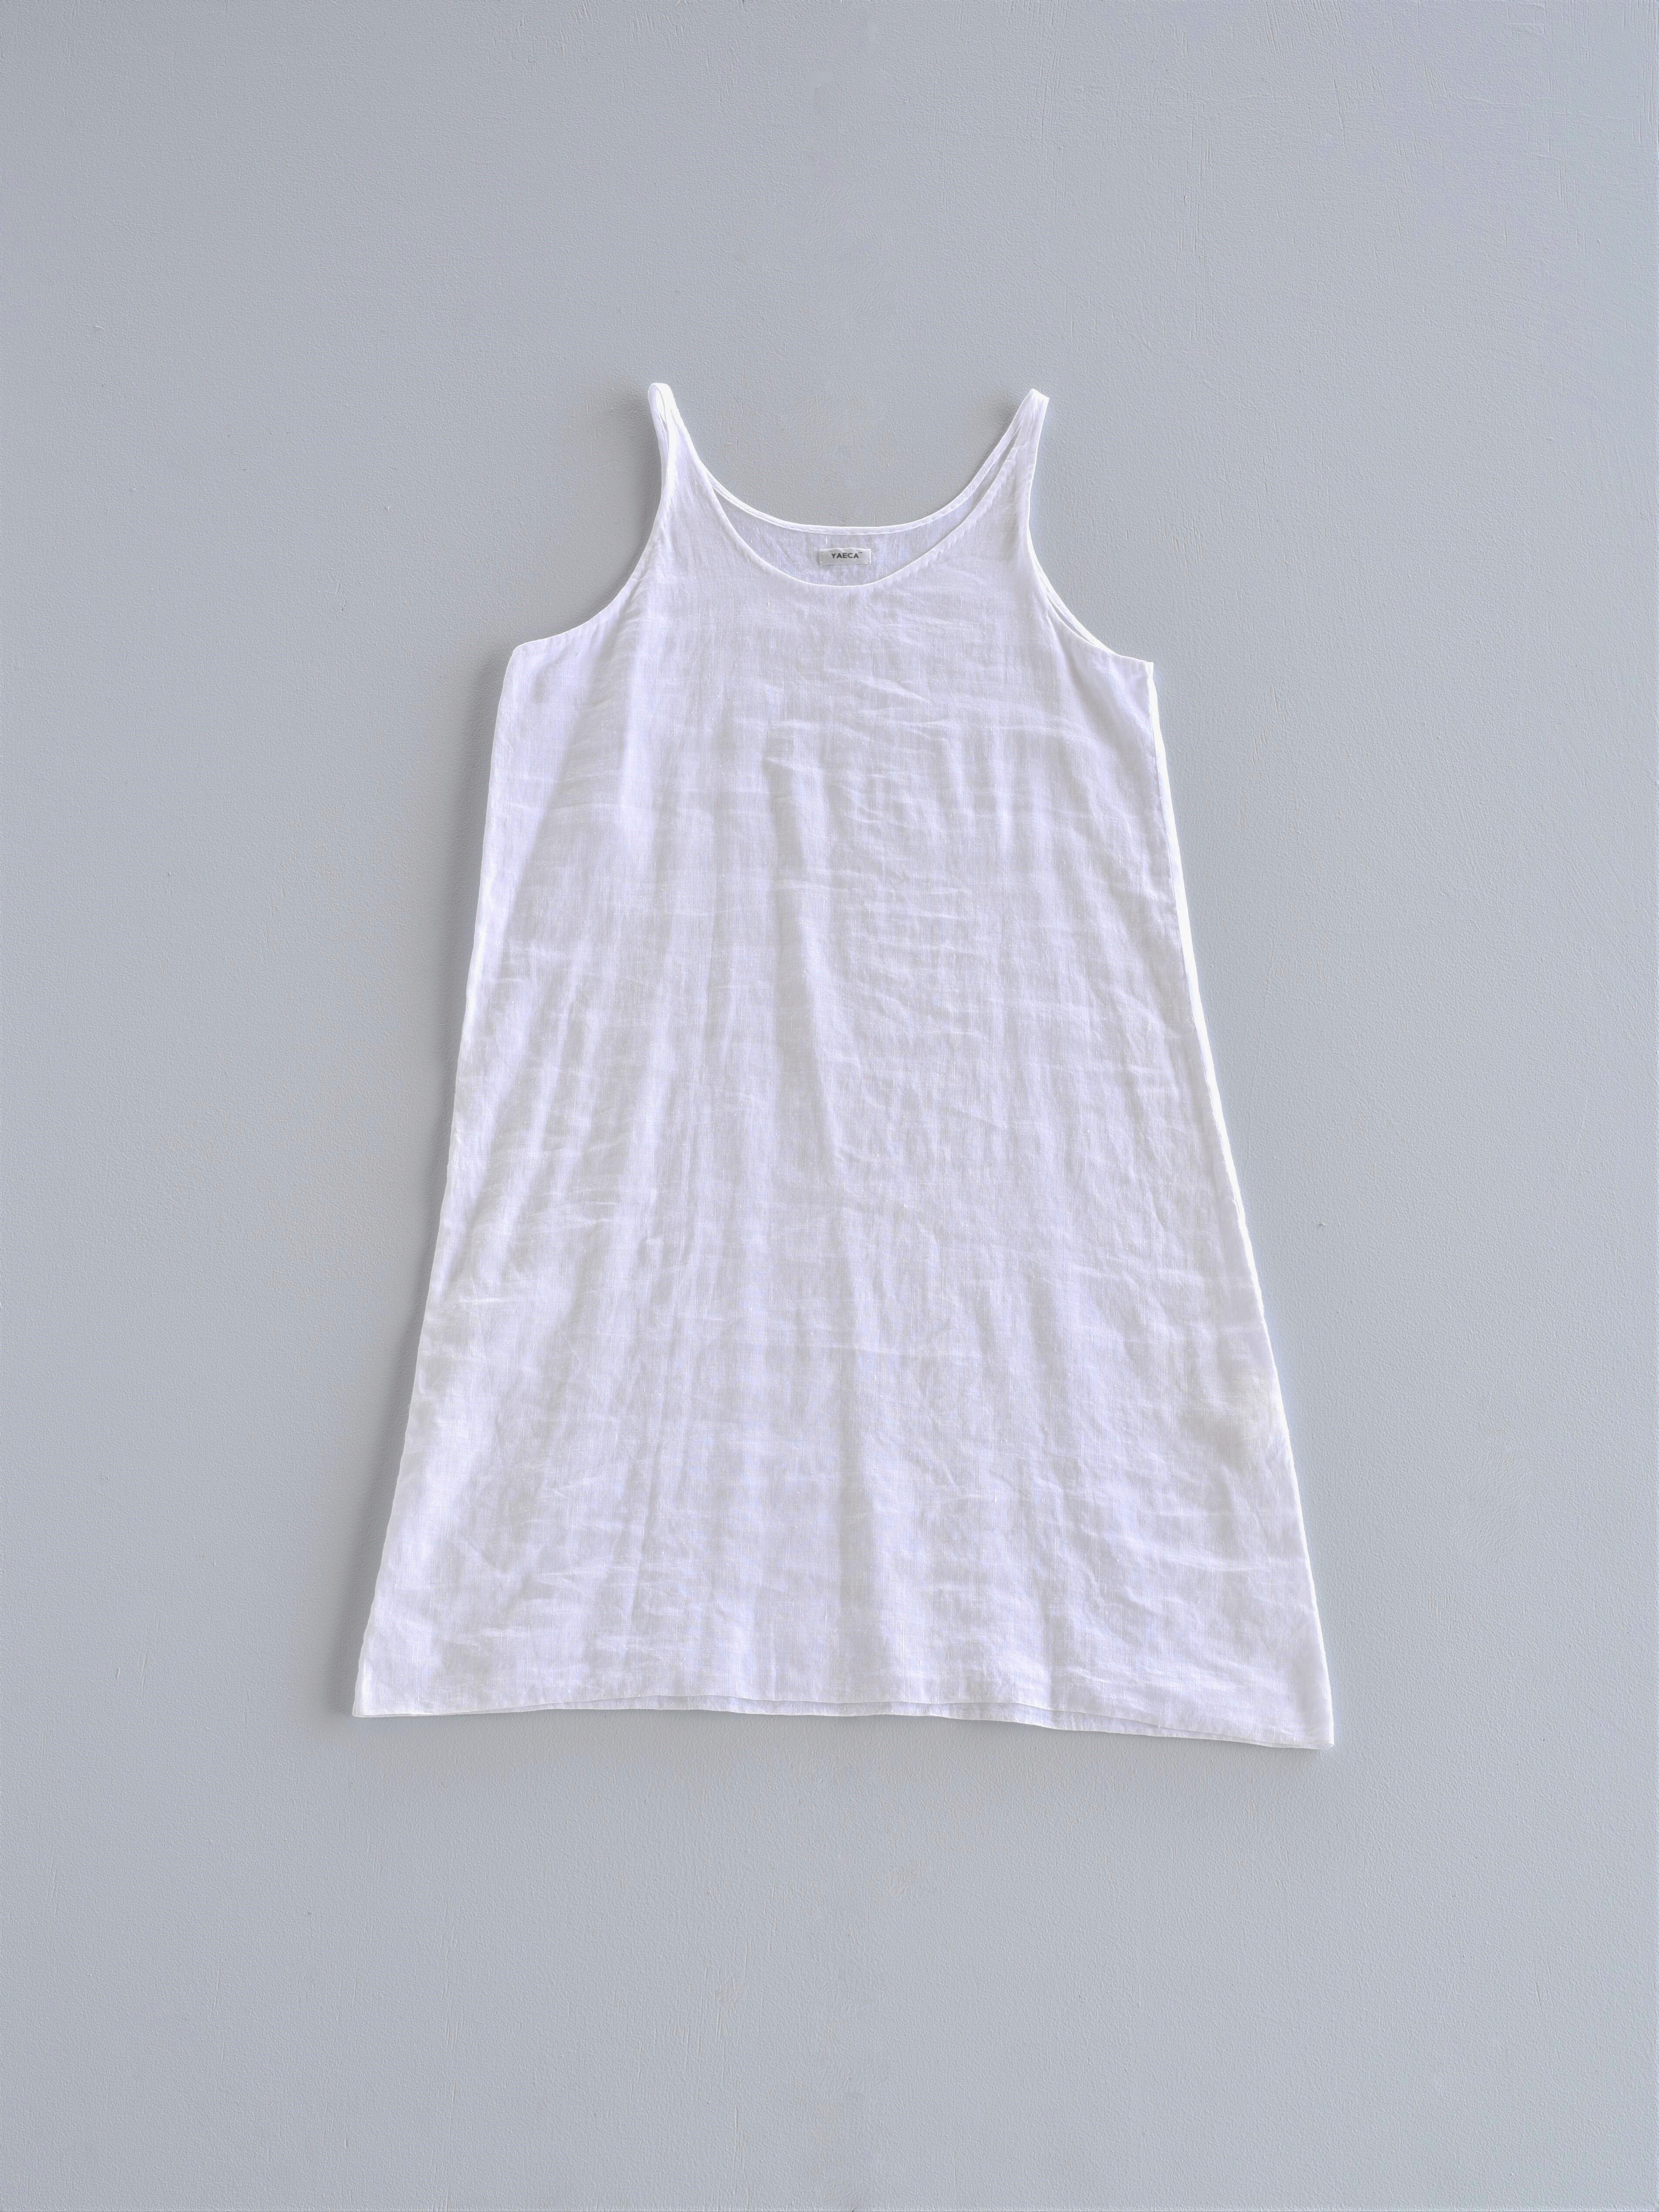 YAECA khadi |インドハンドドレス スリップ white